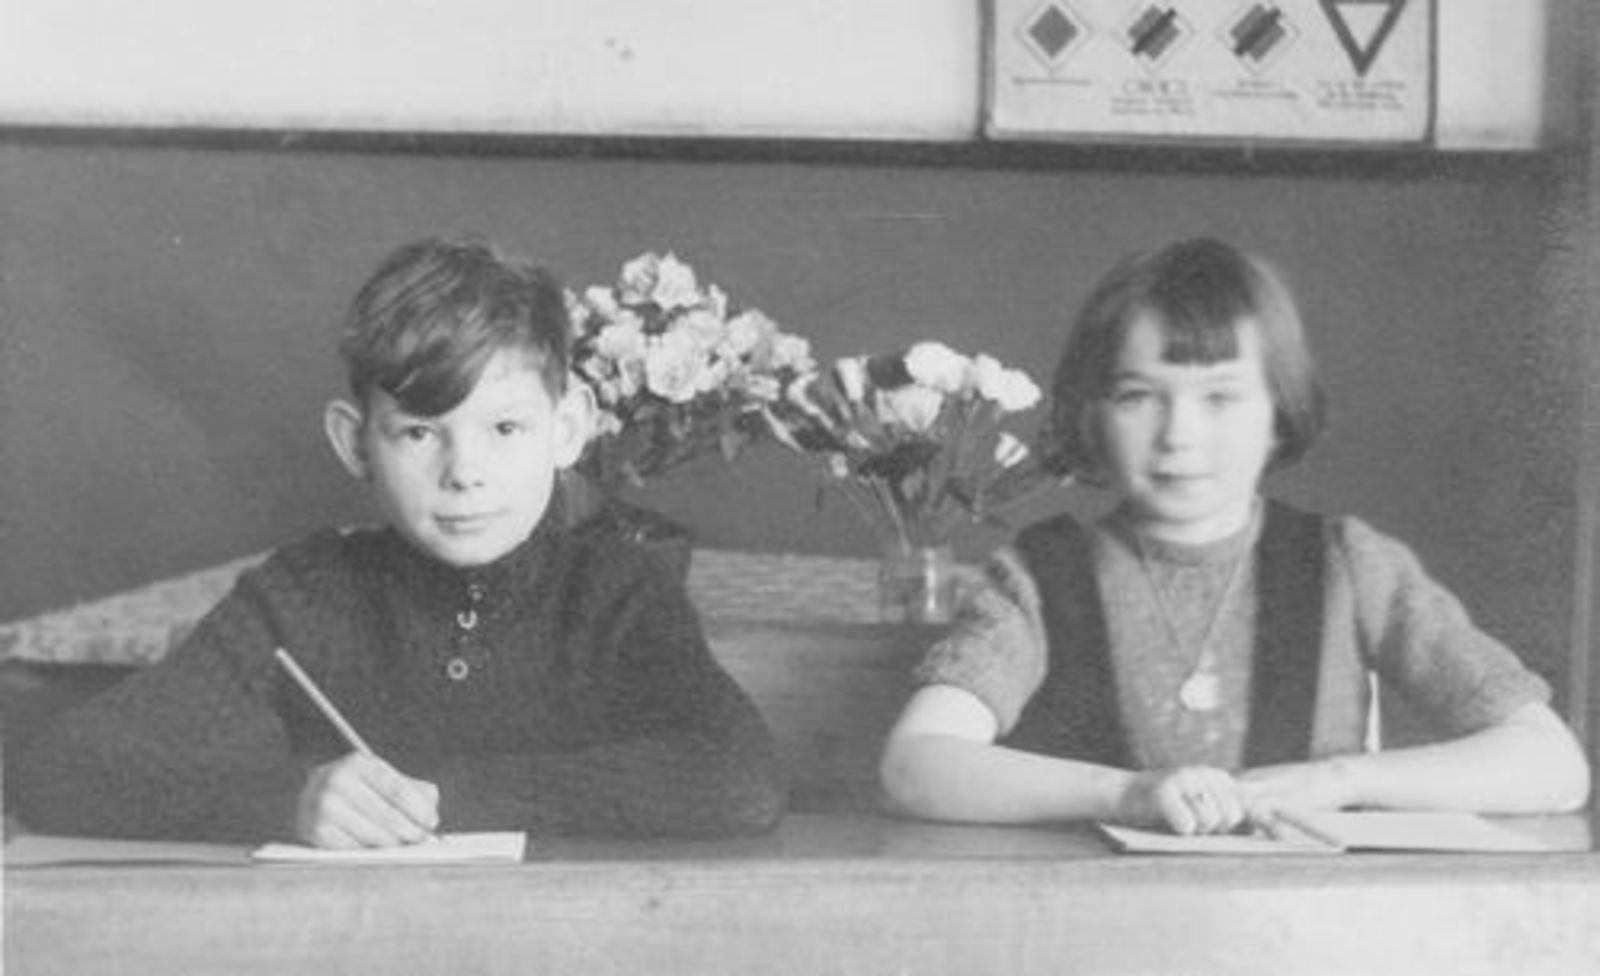 Koolbergen Aad 1941 1950± Schoolfoto met zus Ellie